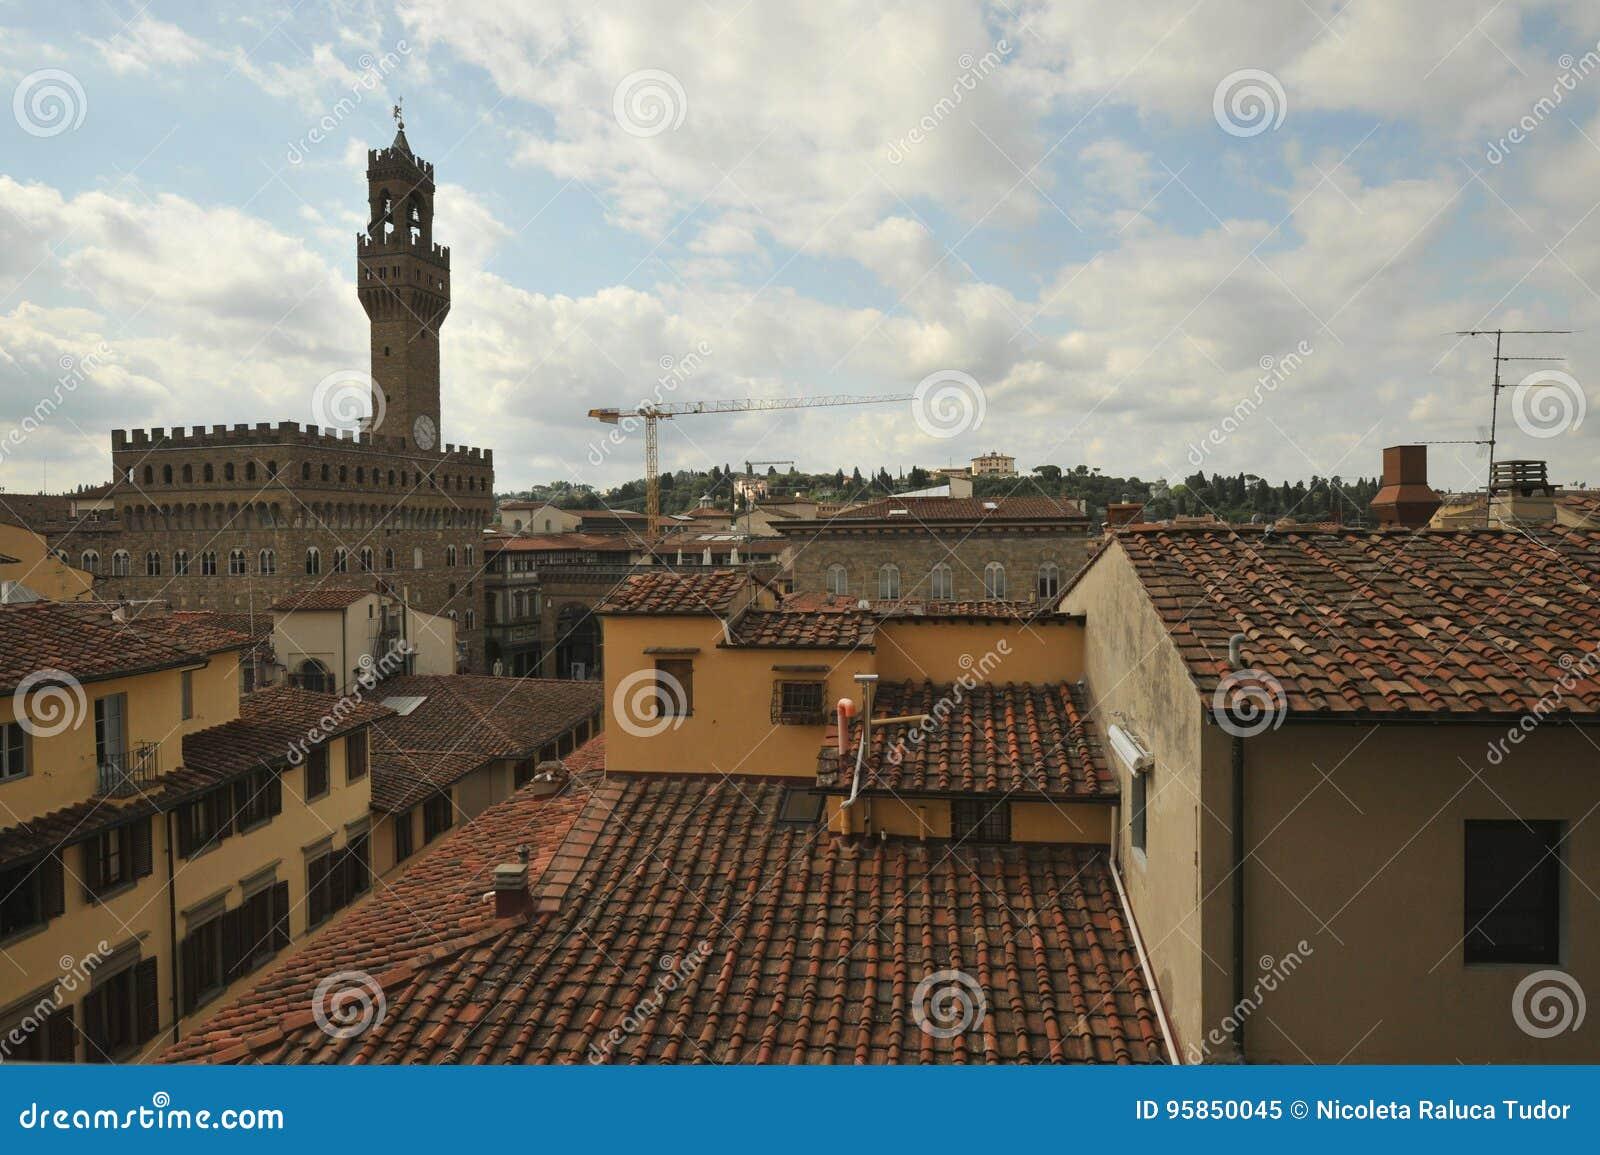 Fantastisk sikt i Florence, Palazzo Vecchio som ses från ett hotell